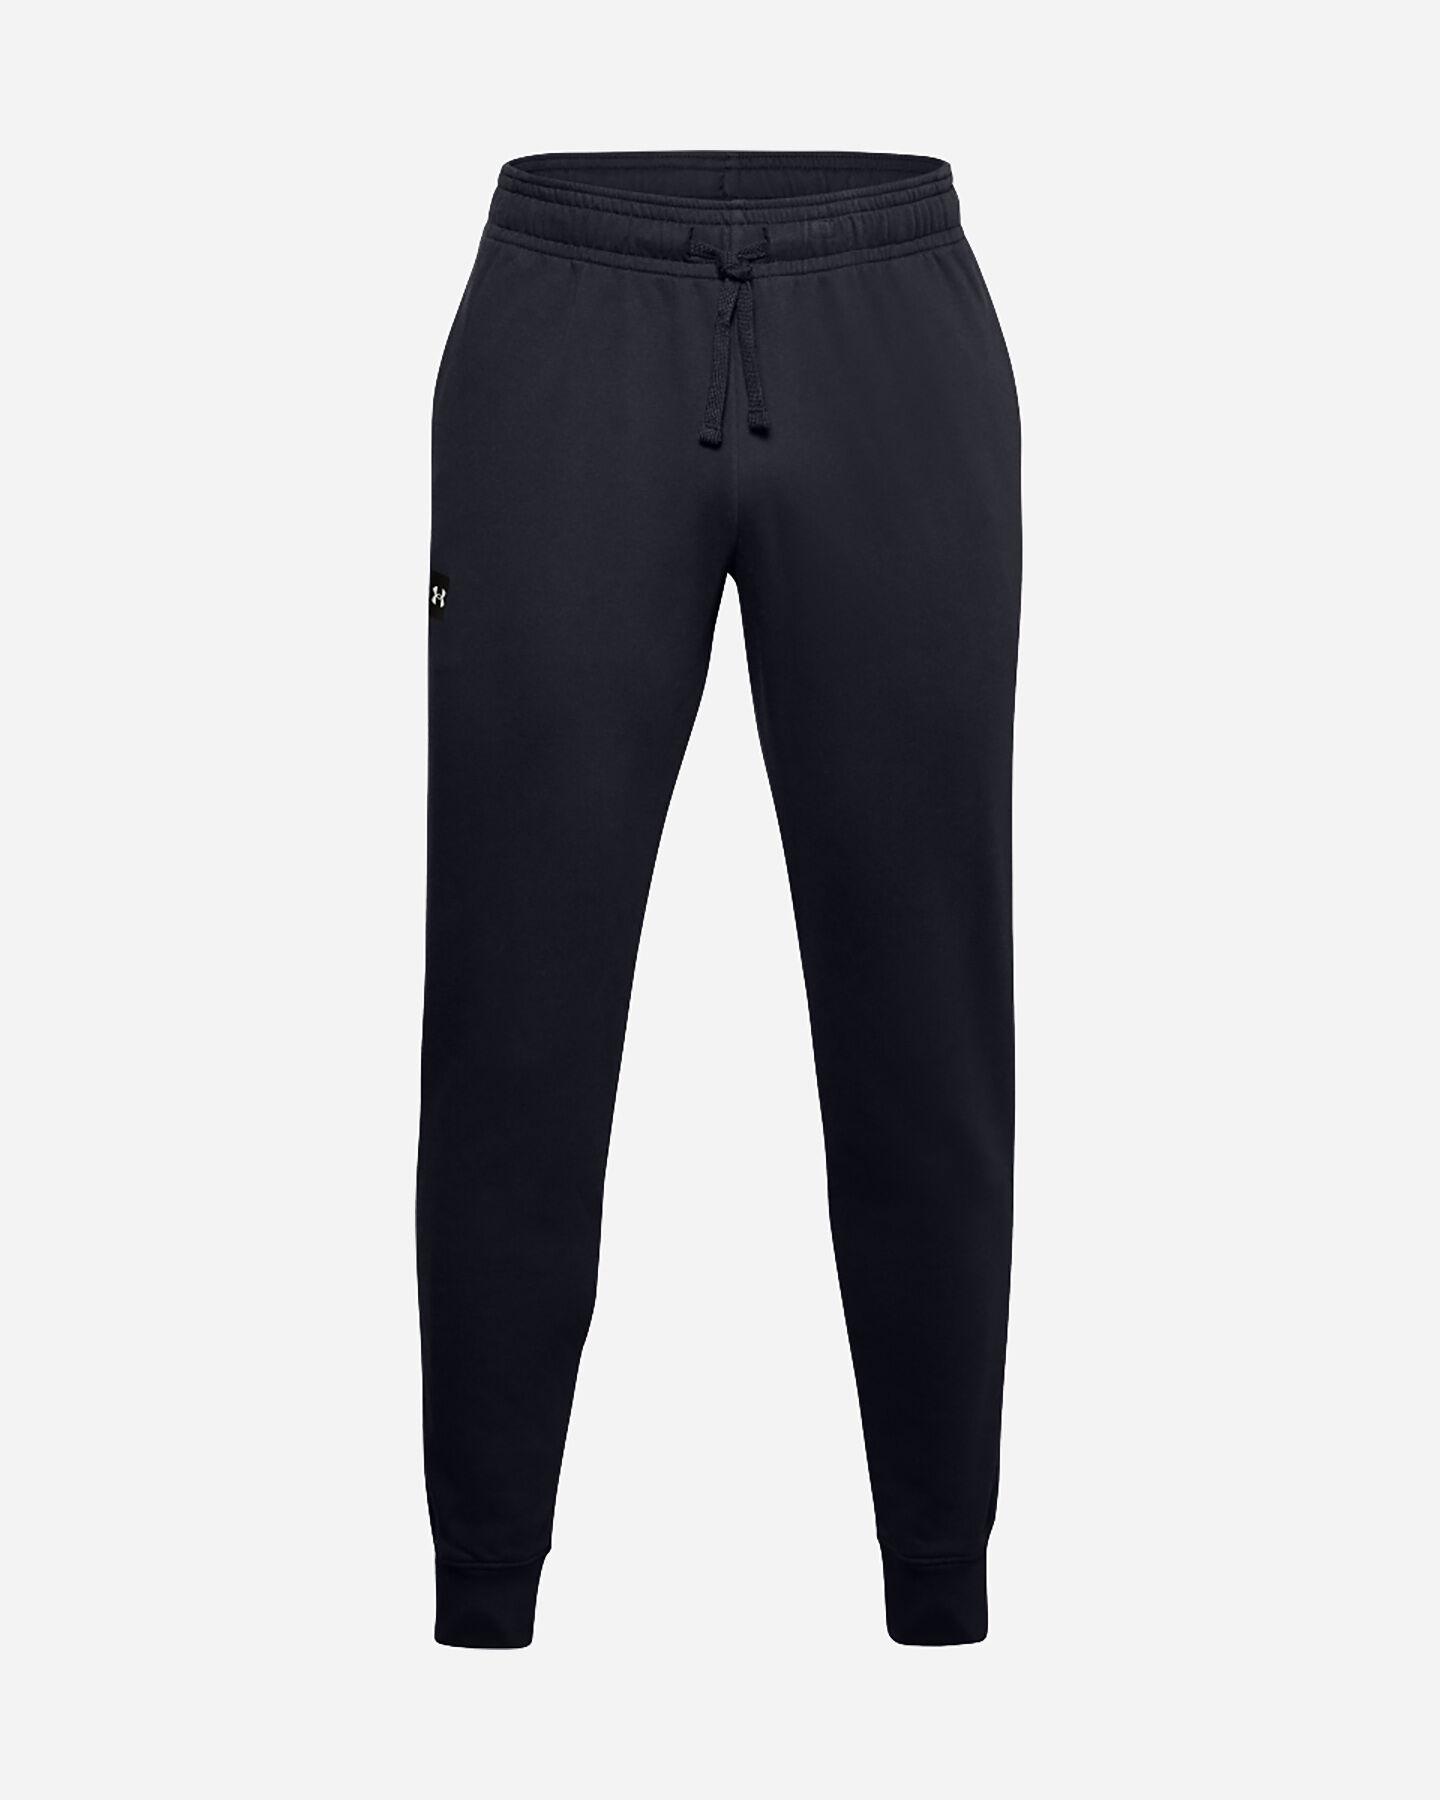 Pantalone UNDER ARMOUR RIVAL M S5229606 scatto 0